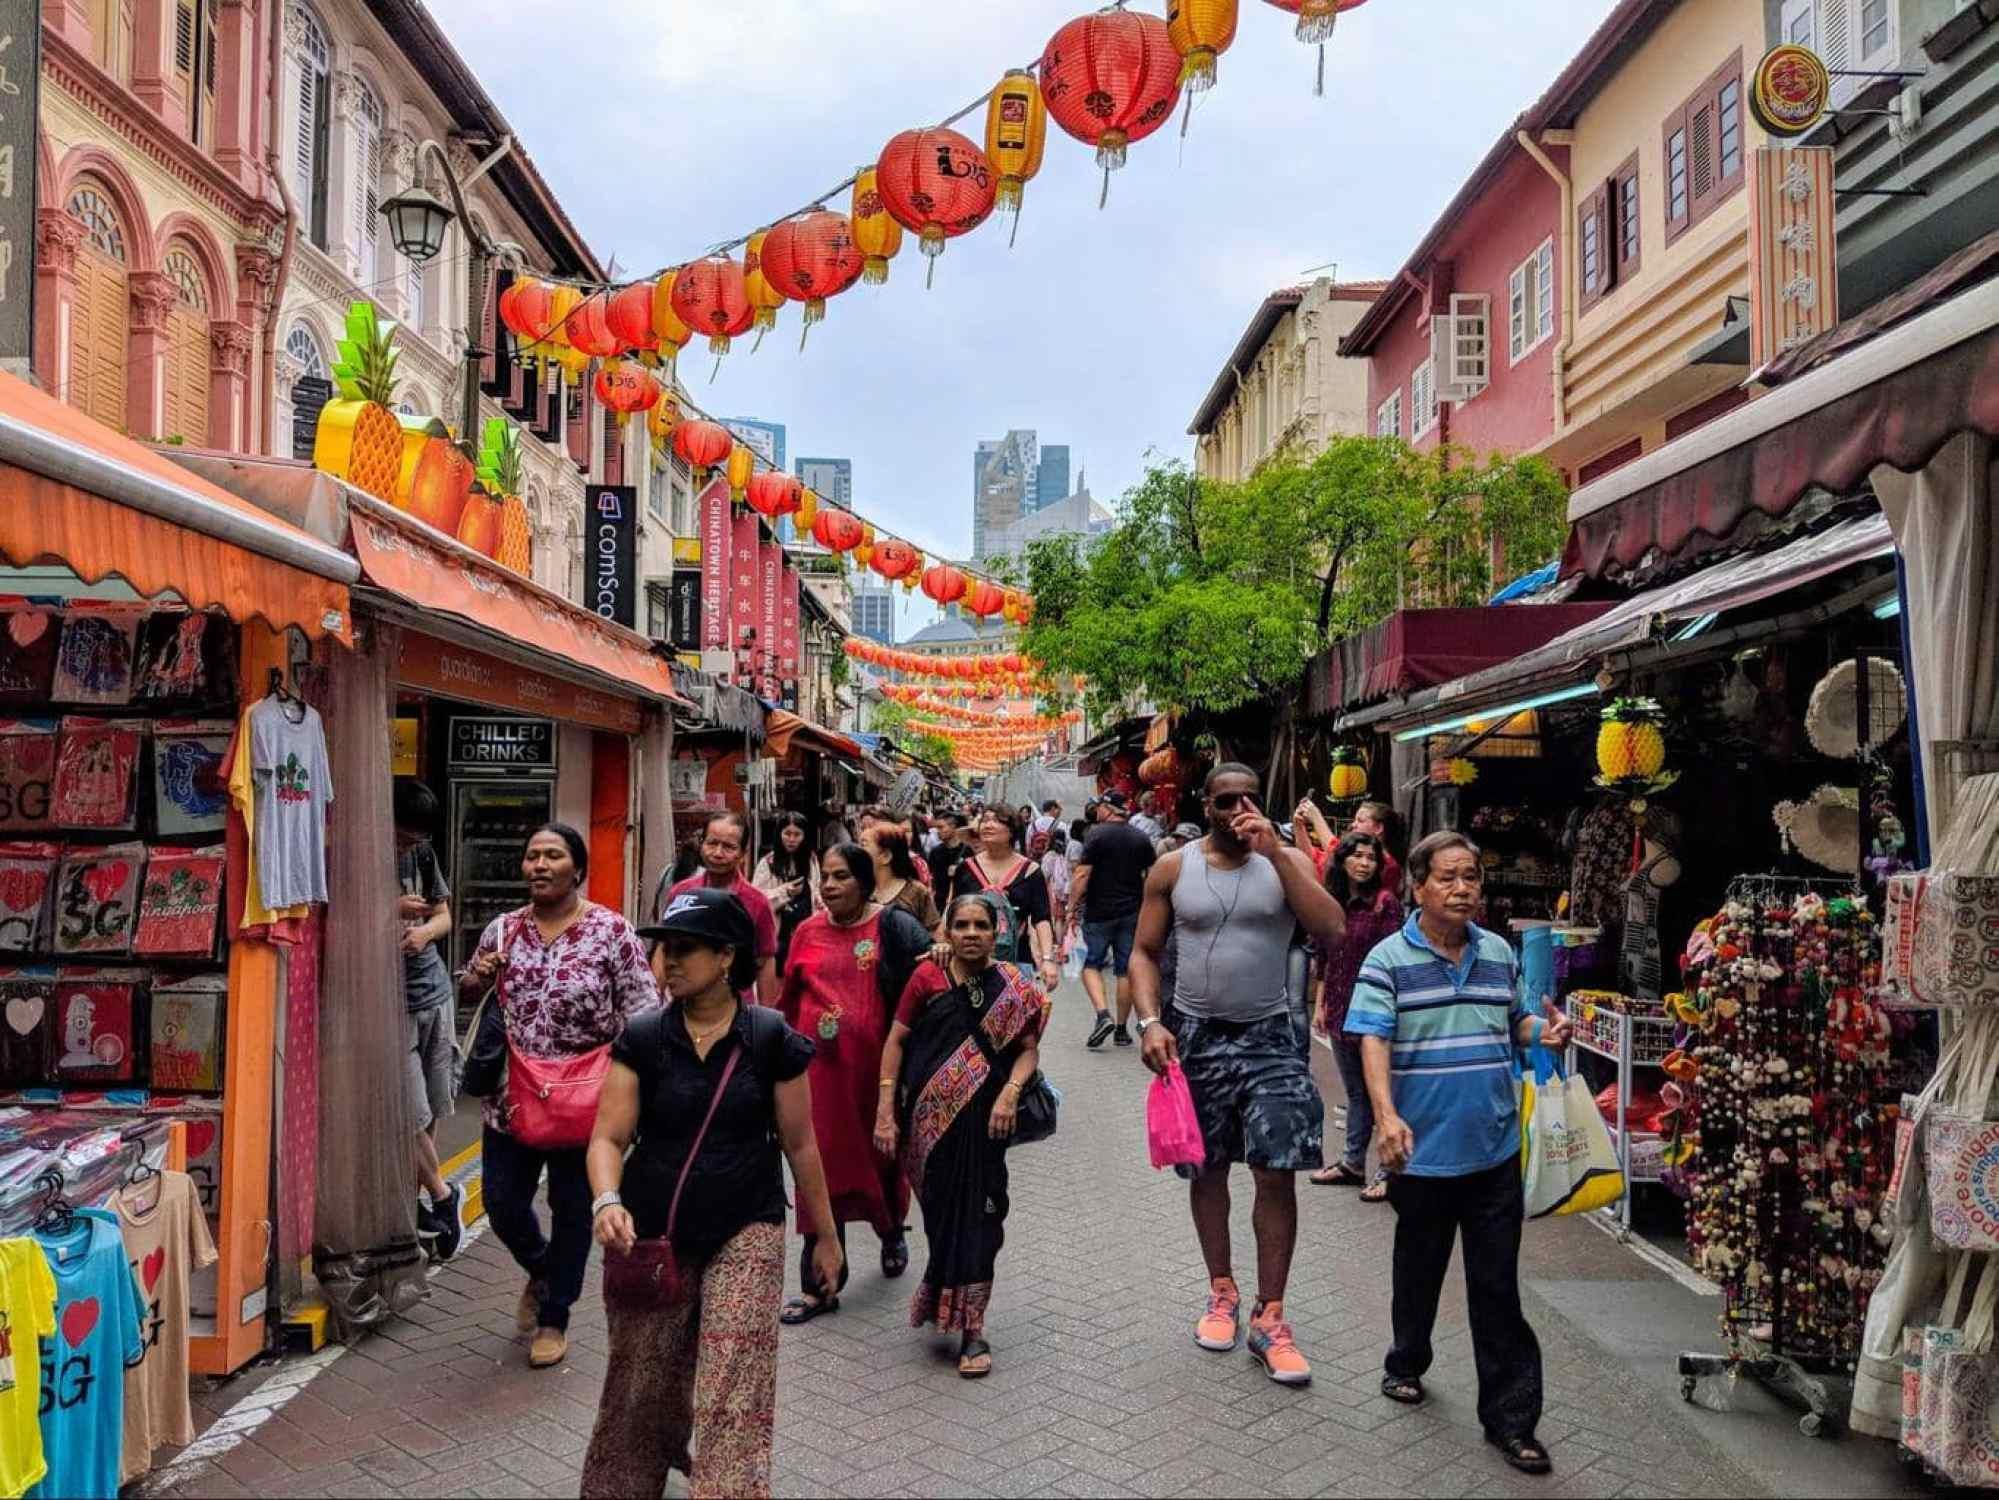 Chinatown Heritage Centre street